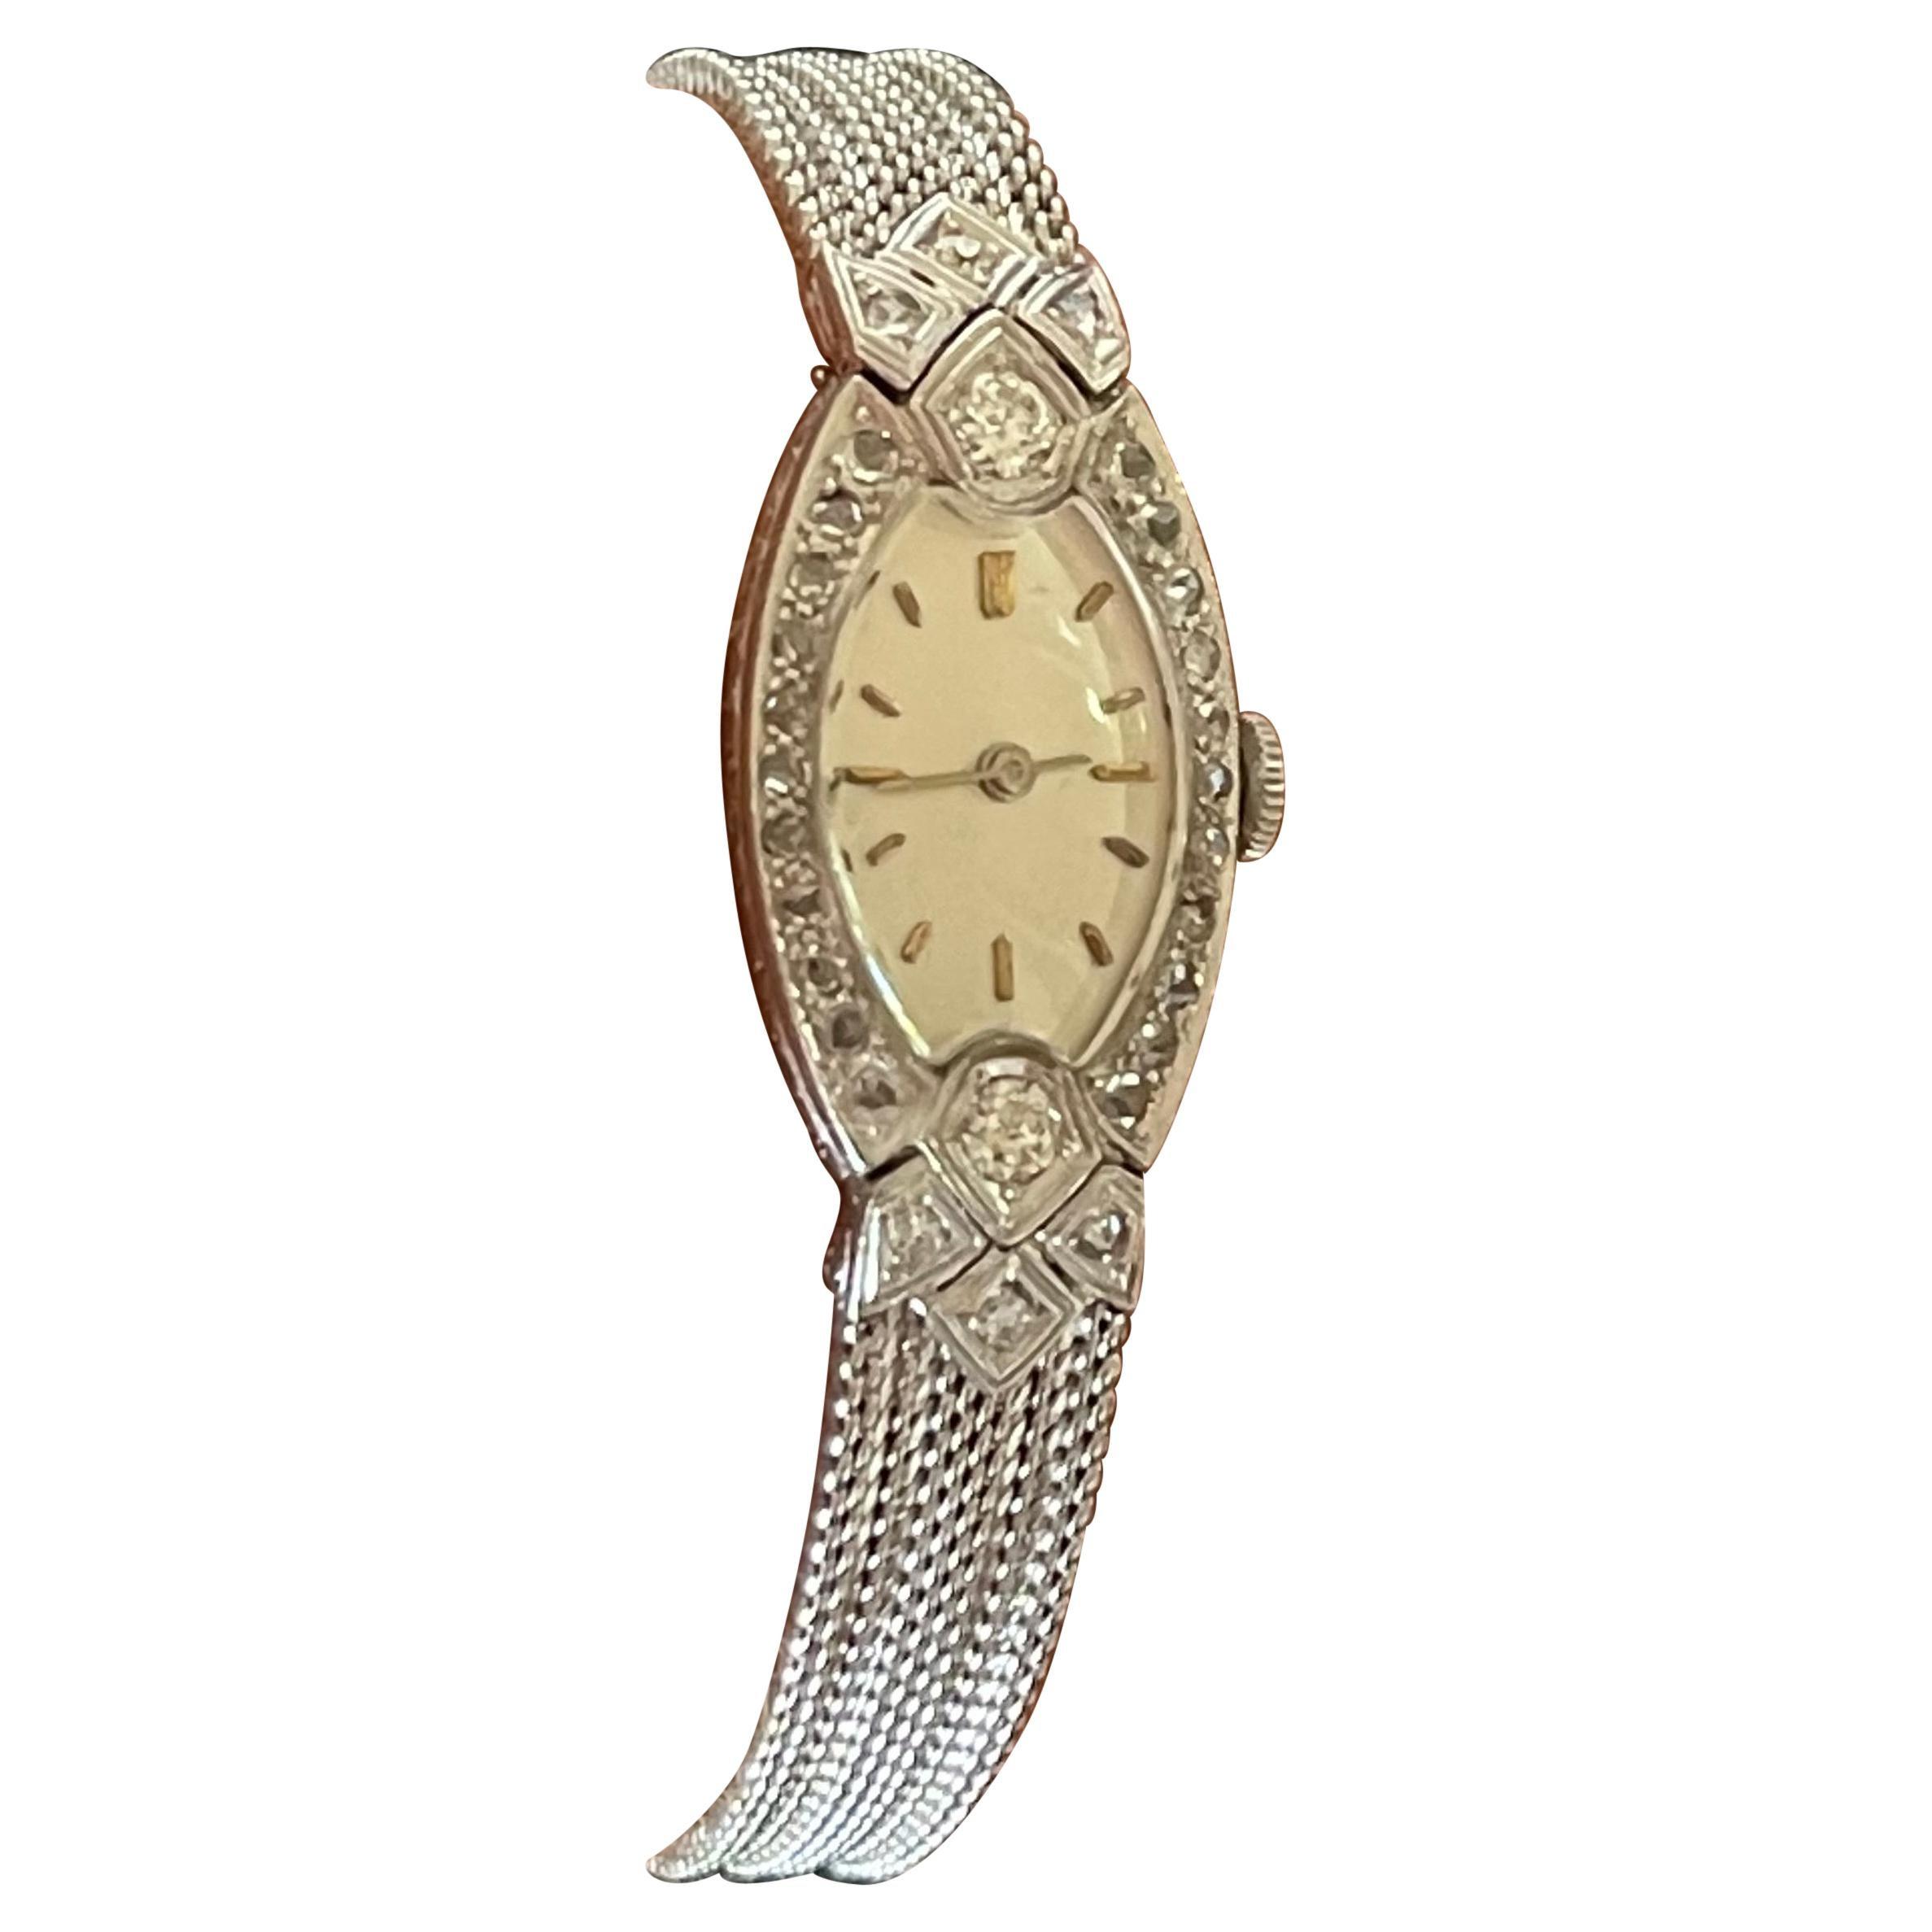 Platinum White Gold Art Deco Diamond Wrist Watch